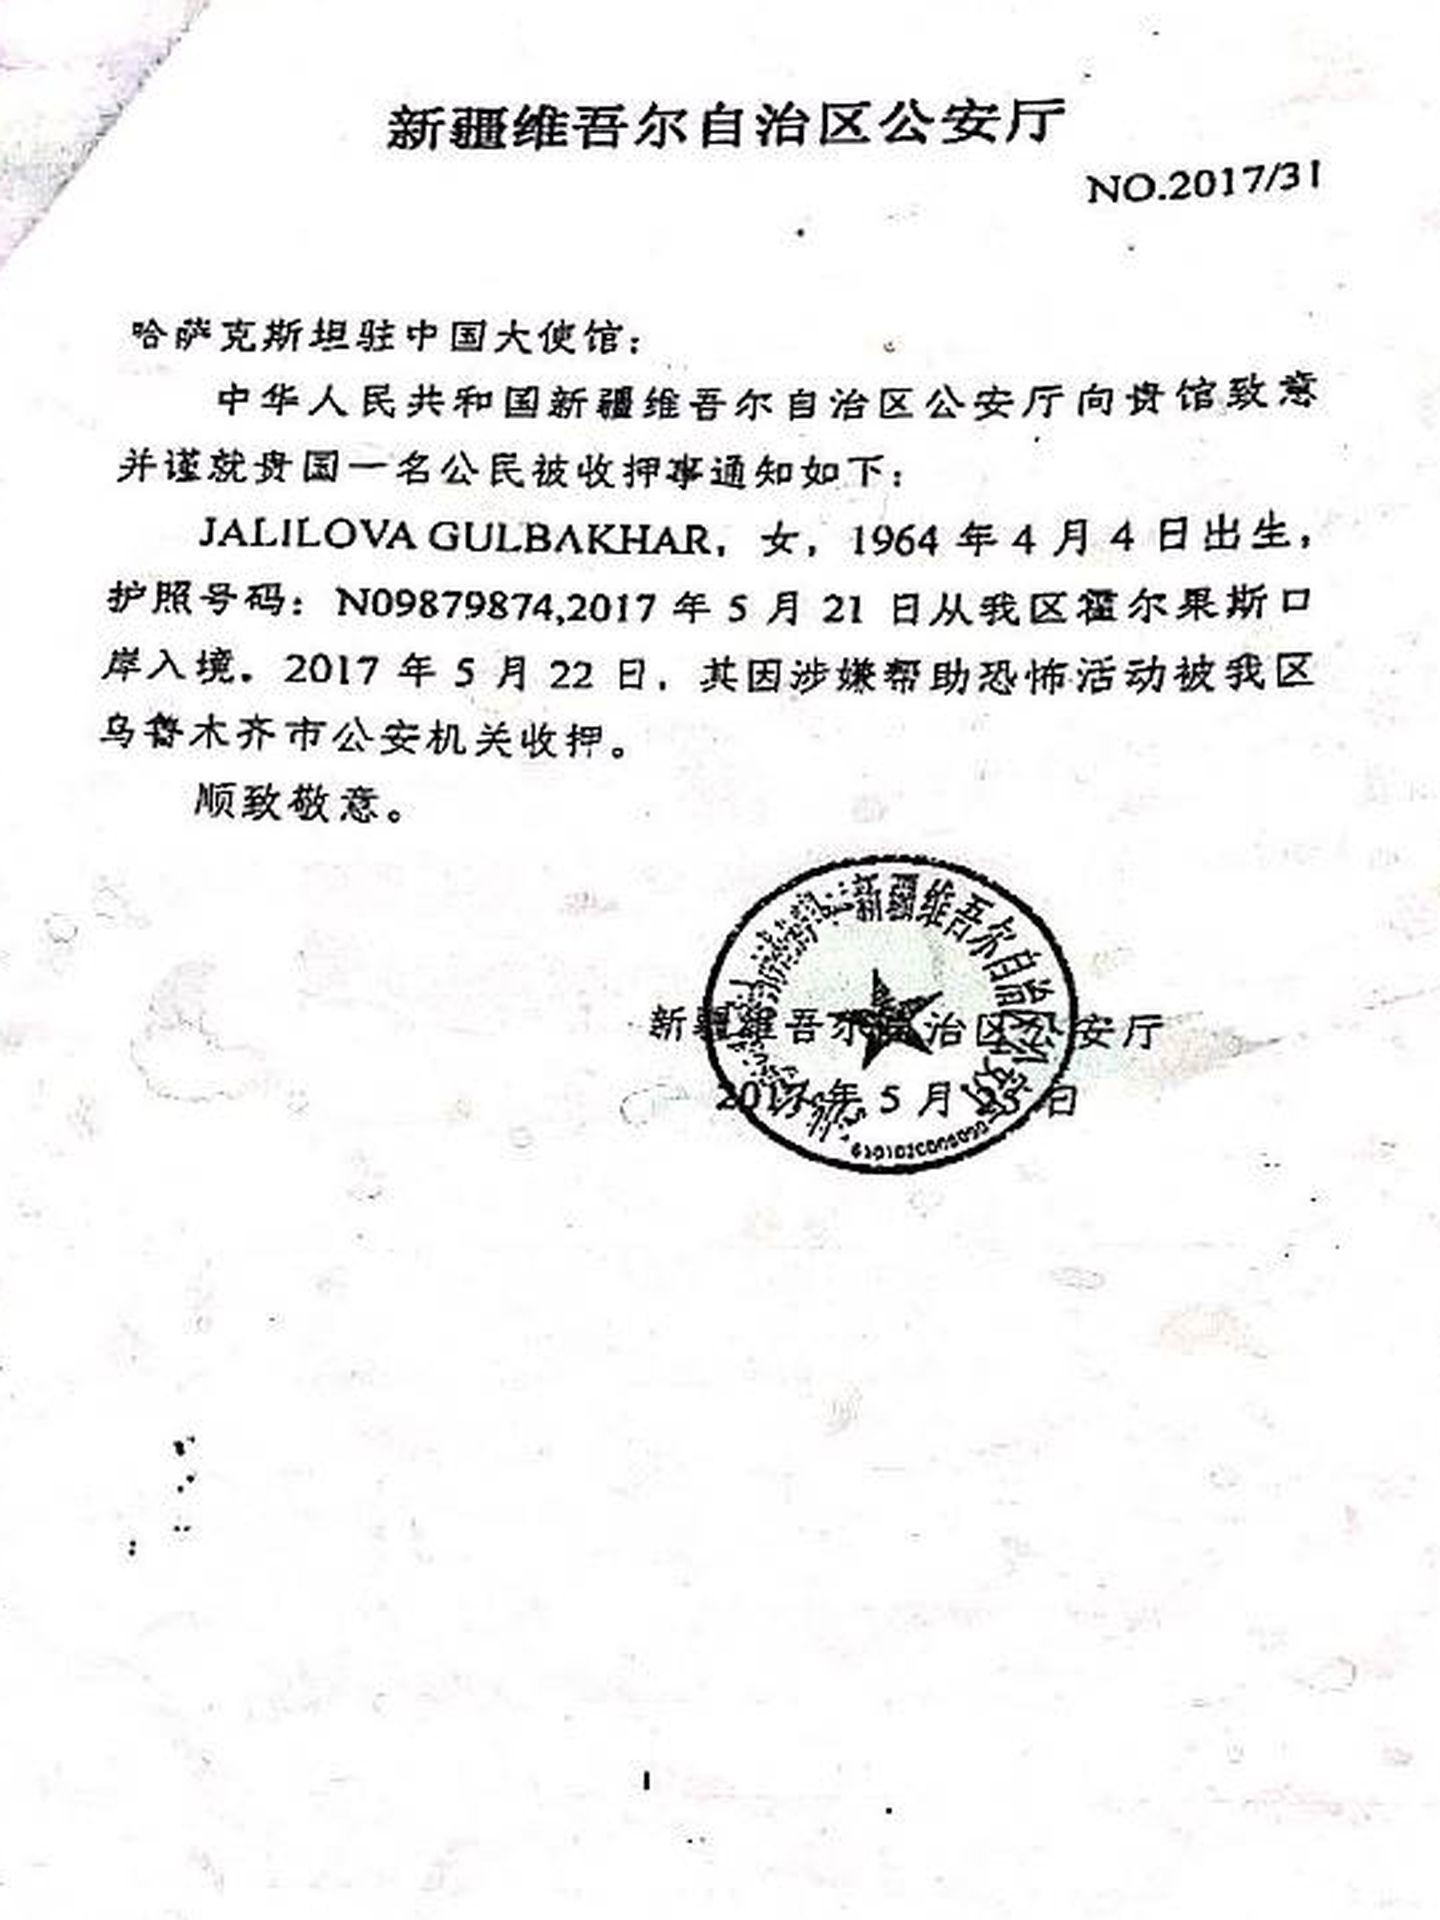 Documento en el Gobierno chino acusa a Gulbakhar Jalilova de terrorismo